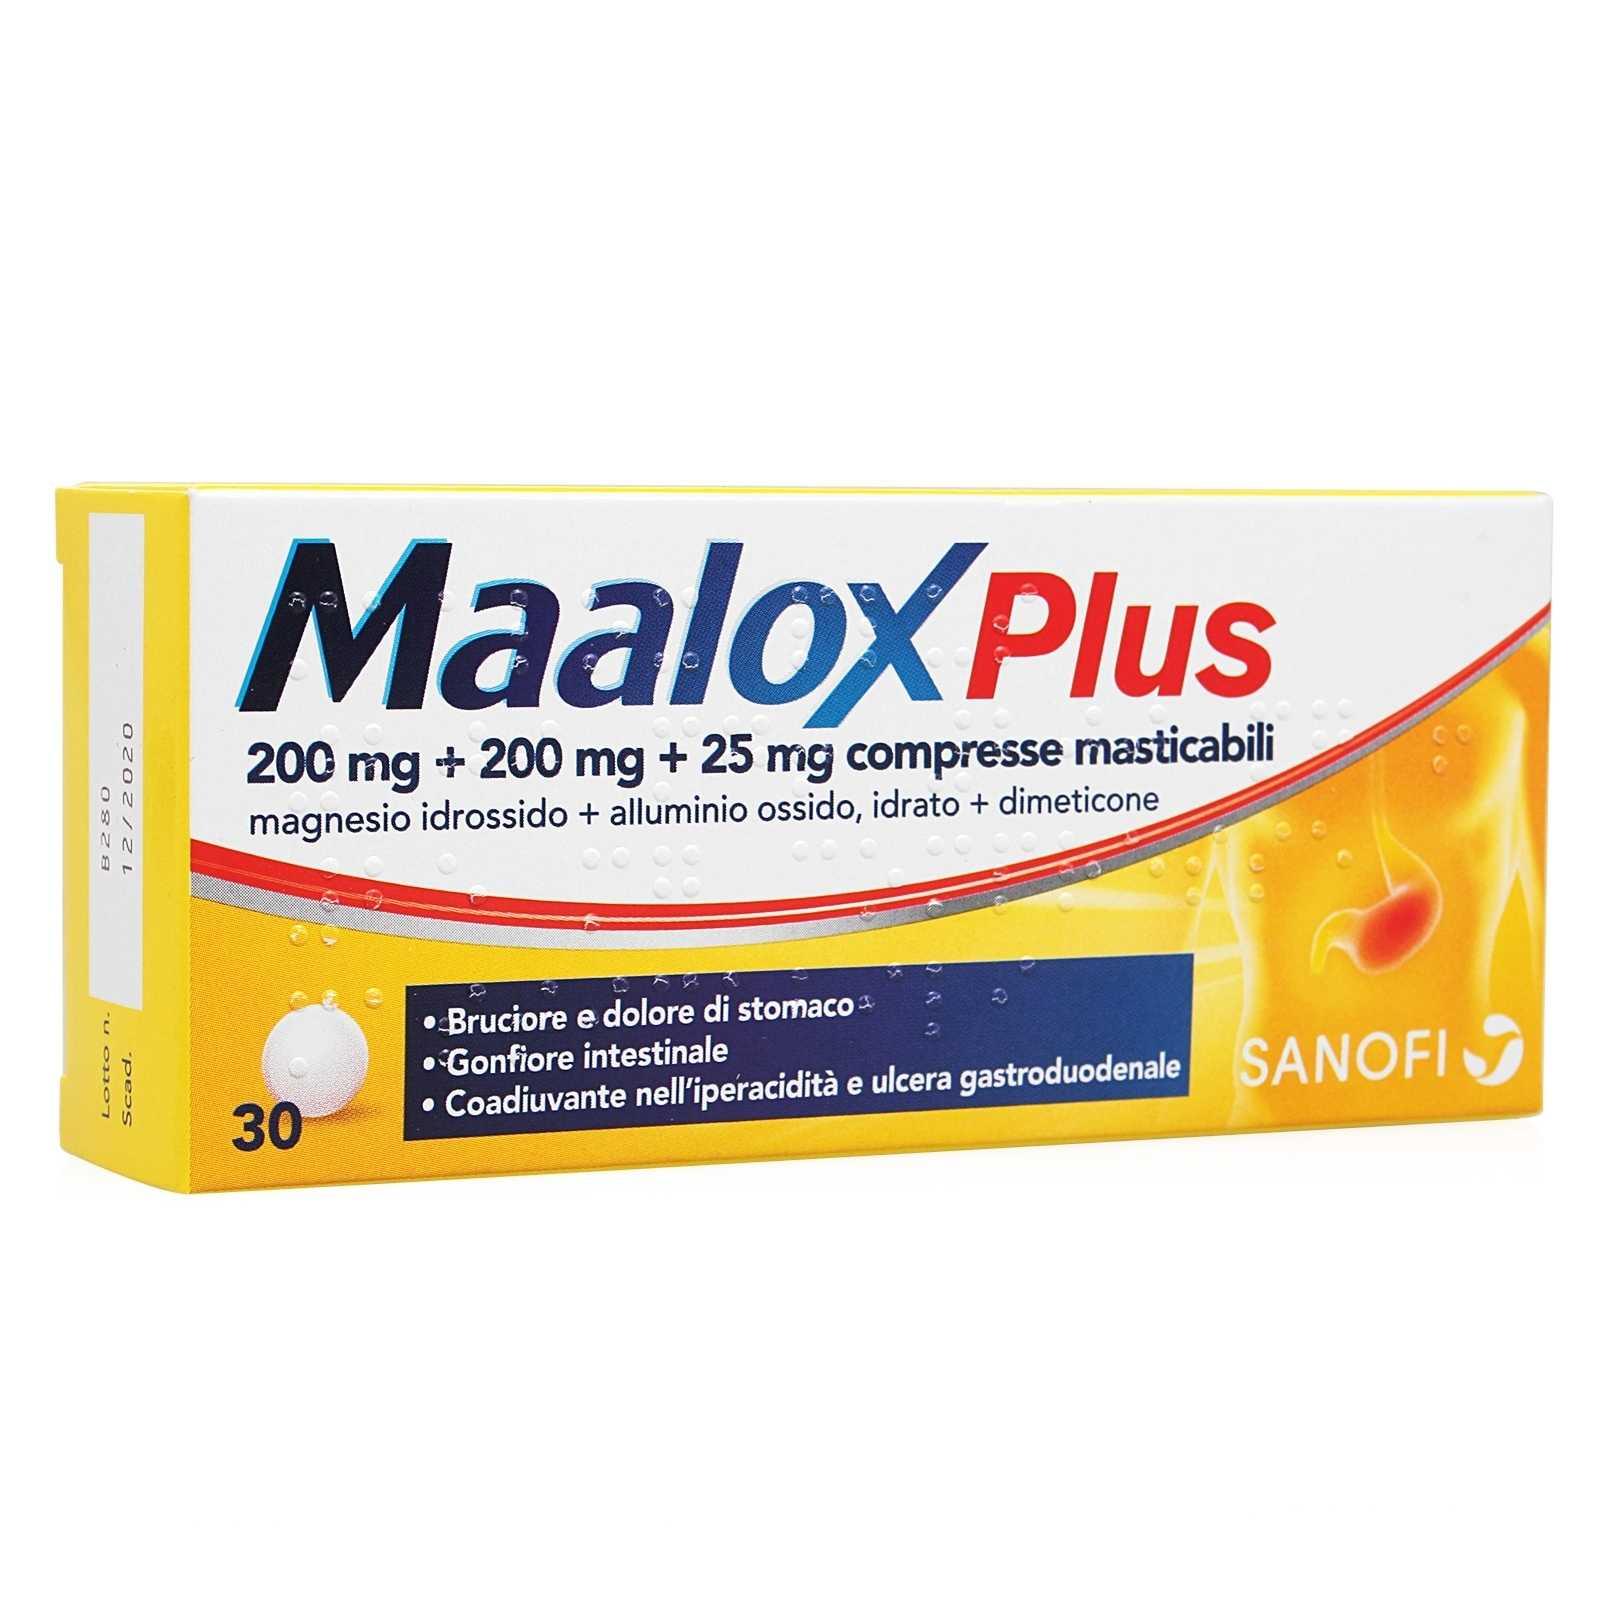 Maalox - Plus - Compresse masticabili